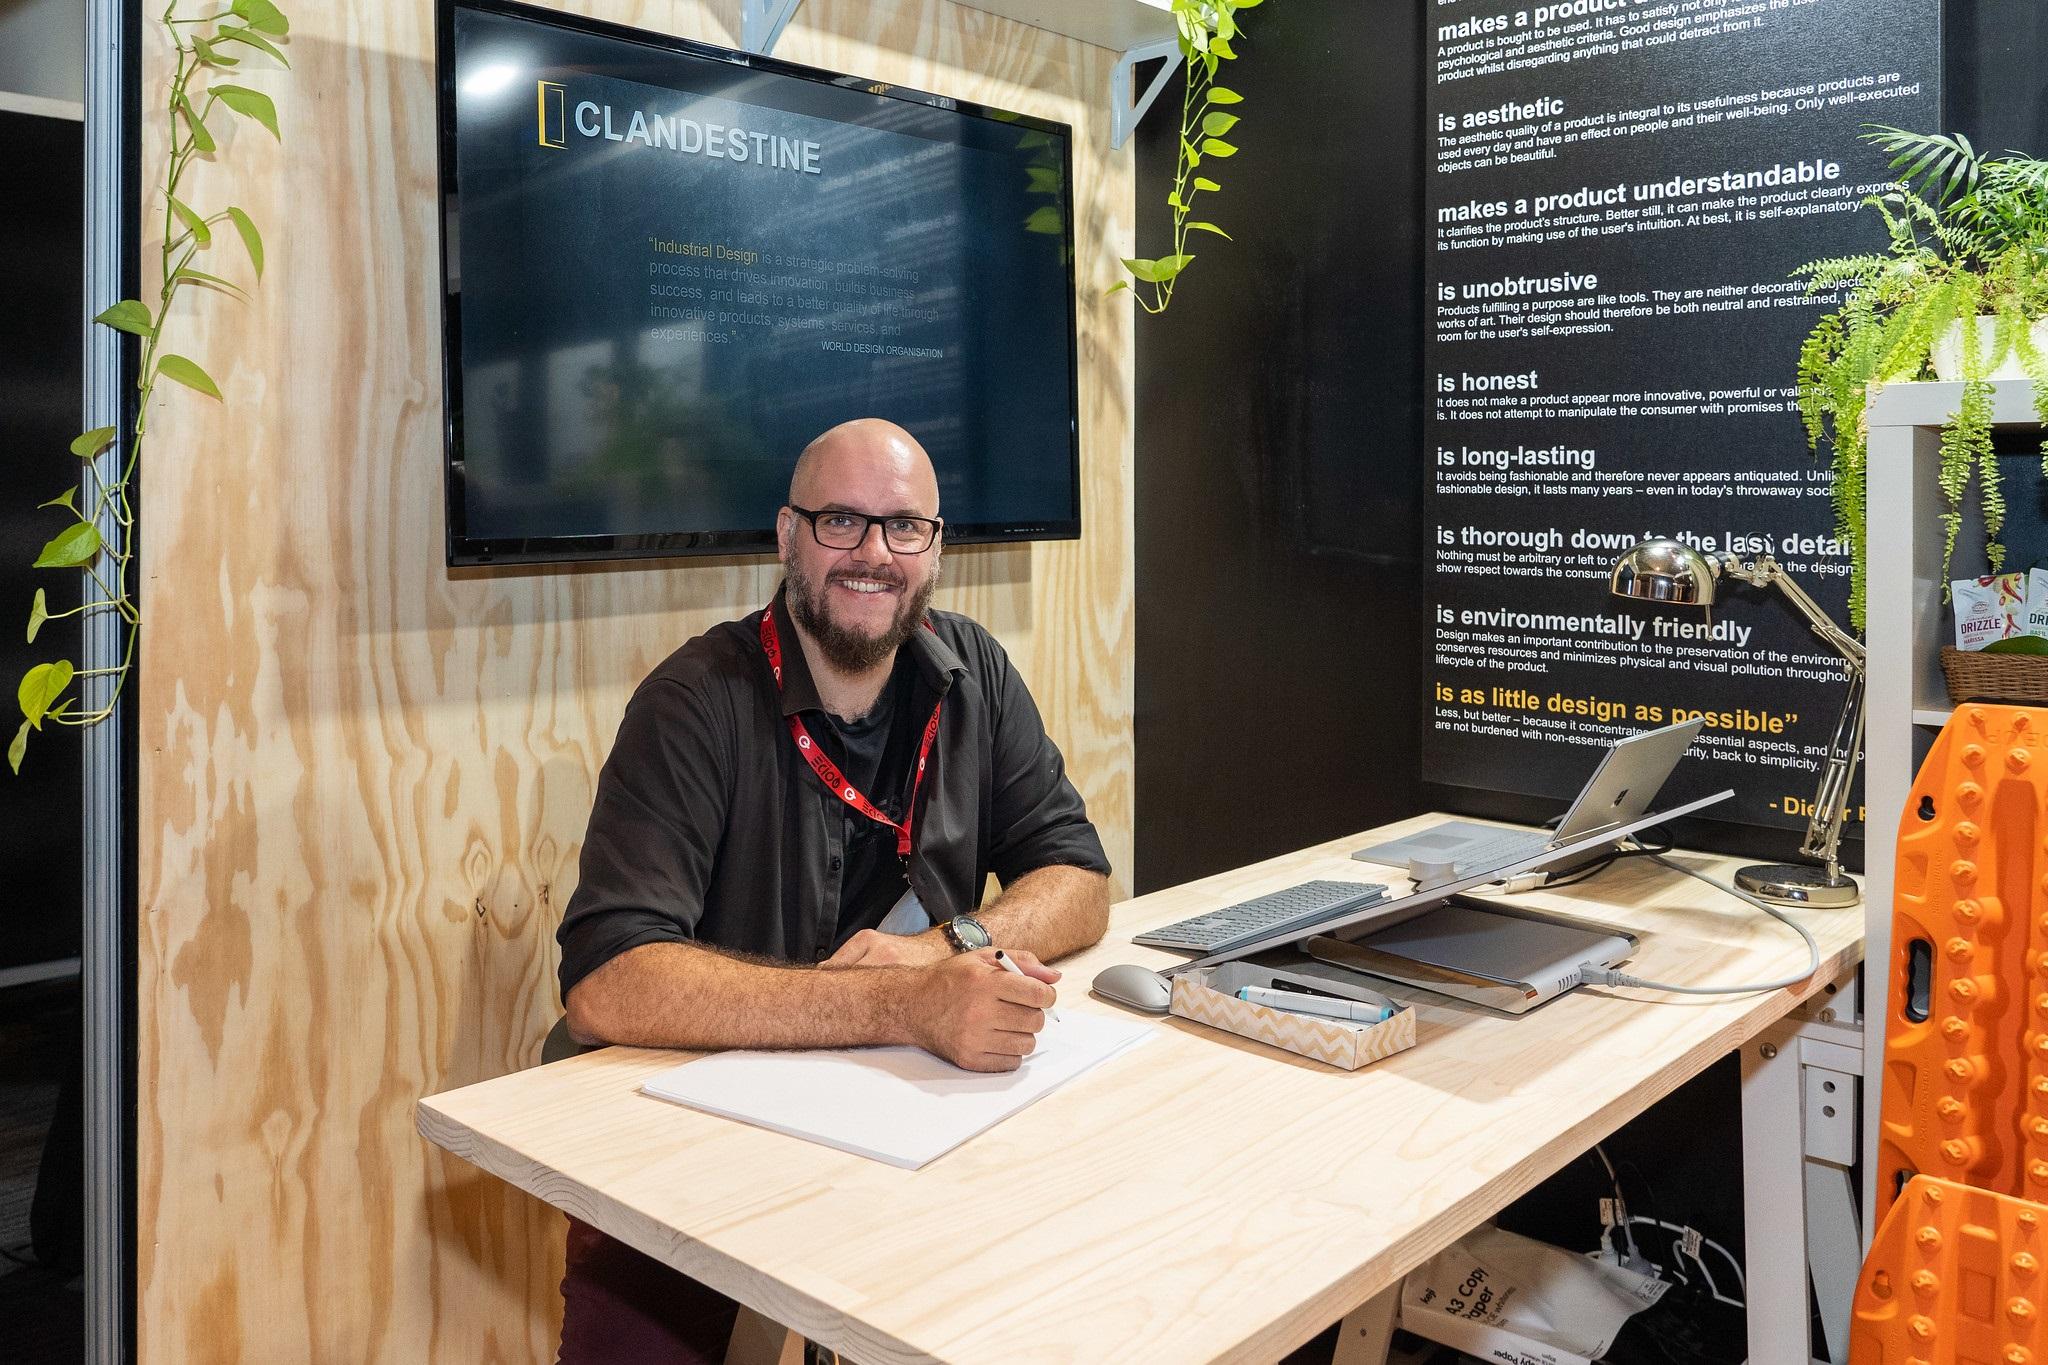 CDG's Design Director Neil Davidson manning our booth at QODE